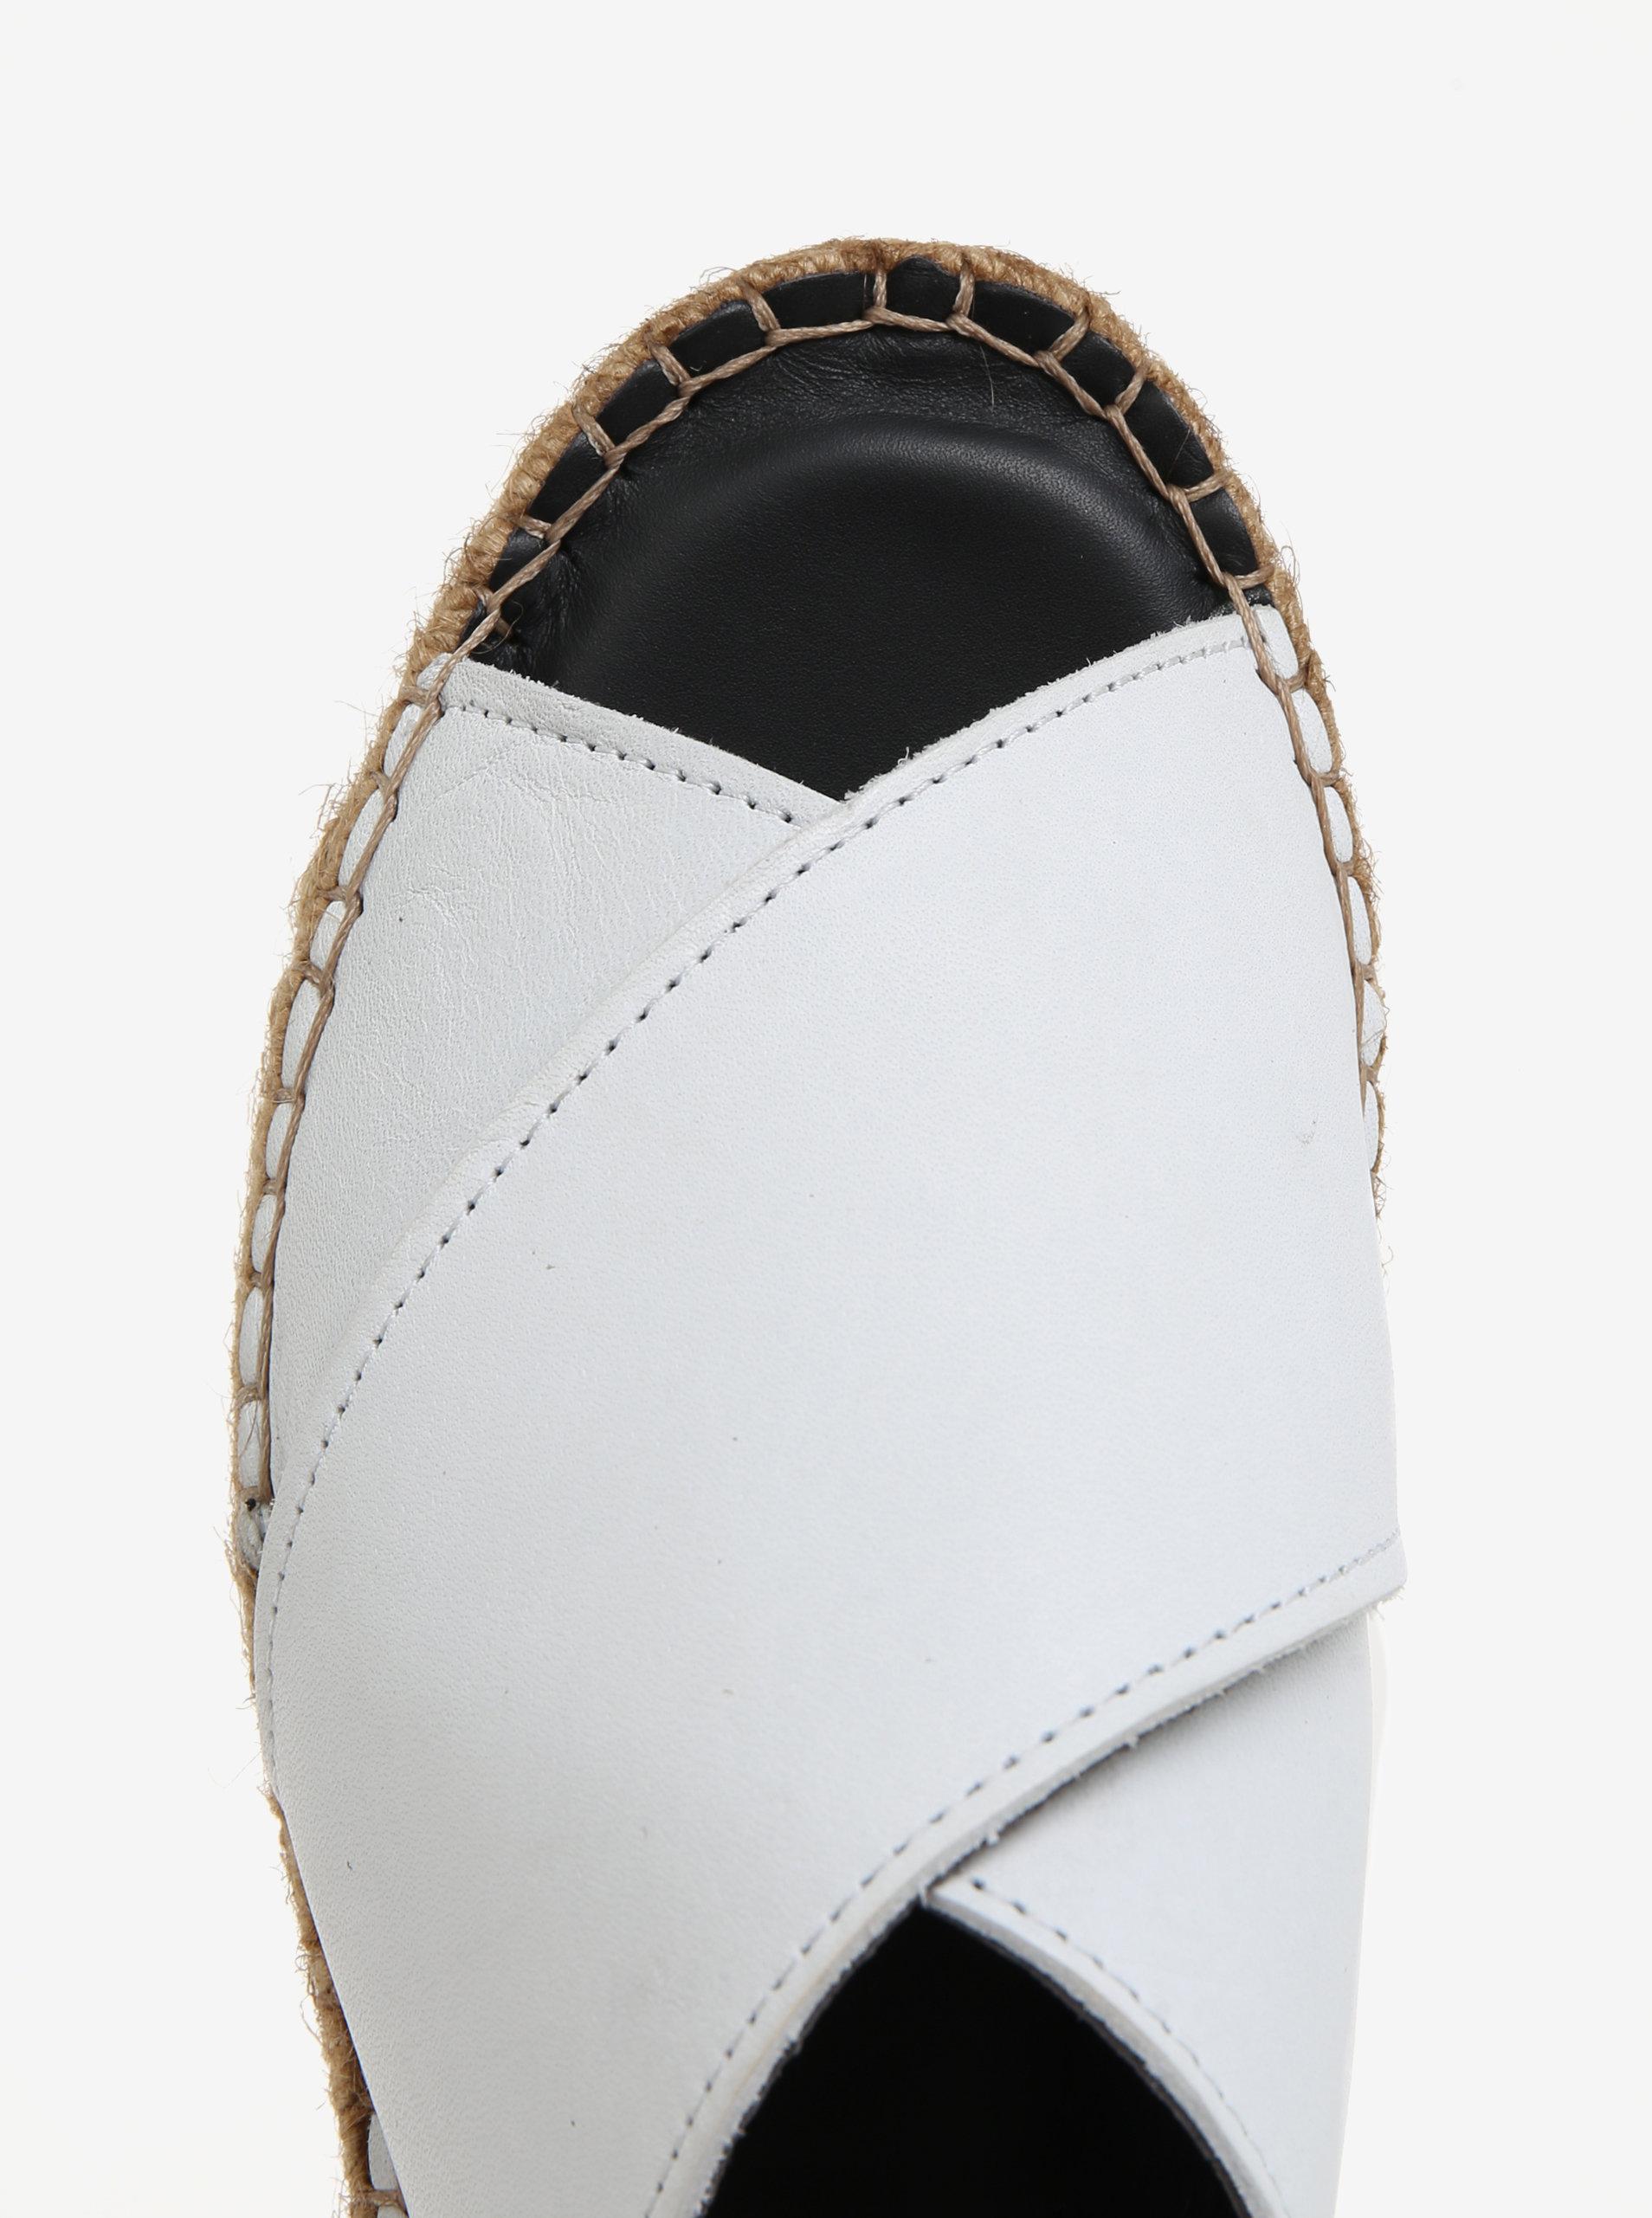 6d20d3033021 Biele dámske kožené šľapky na platforme Royal RepubliQ ...